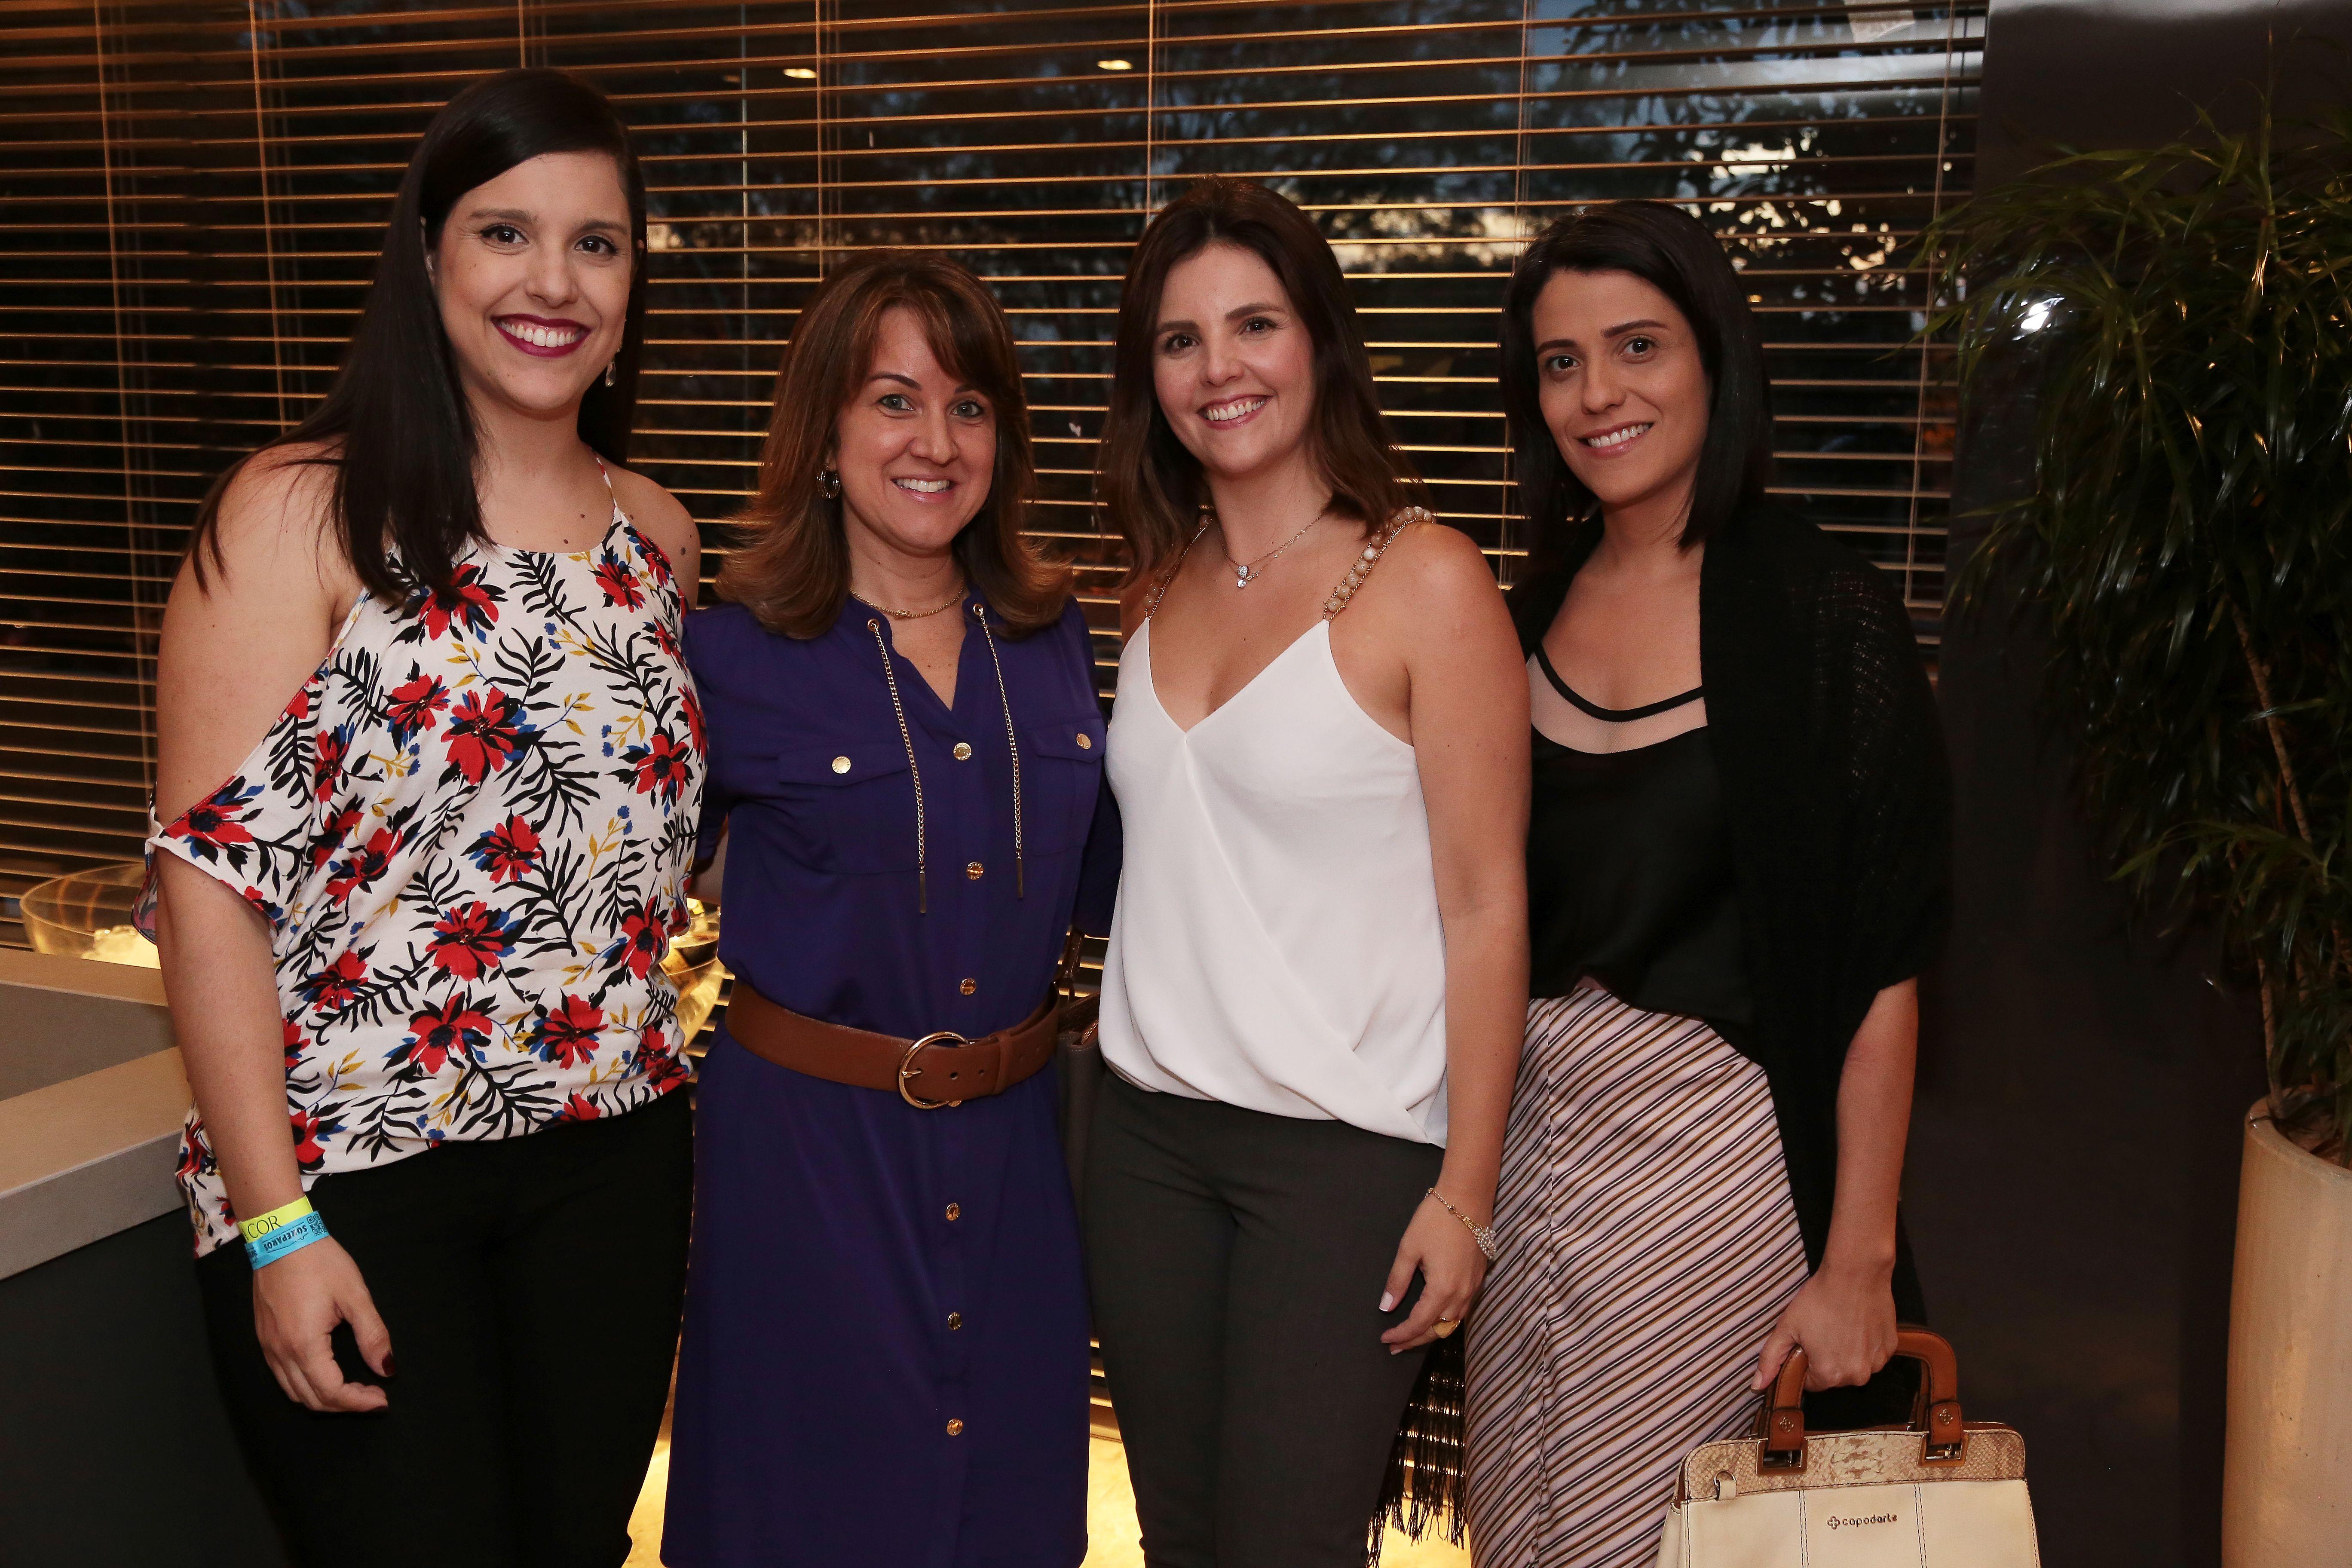 Ismenya Lira, Gislaine Garonce, Adriana Nunes e Tatiana Martins